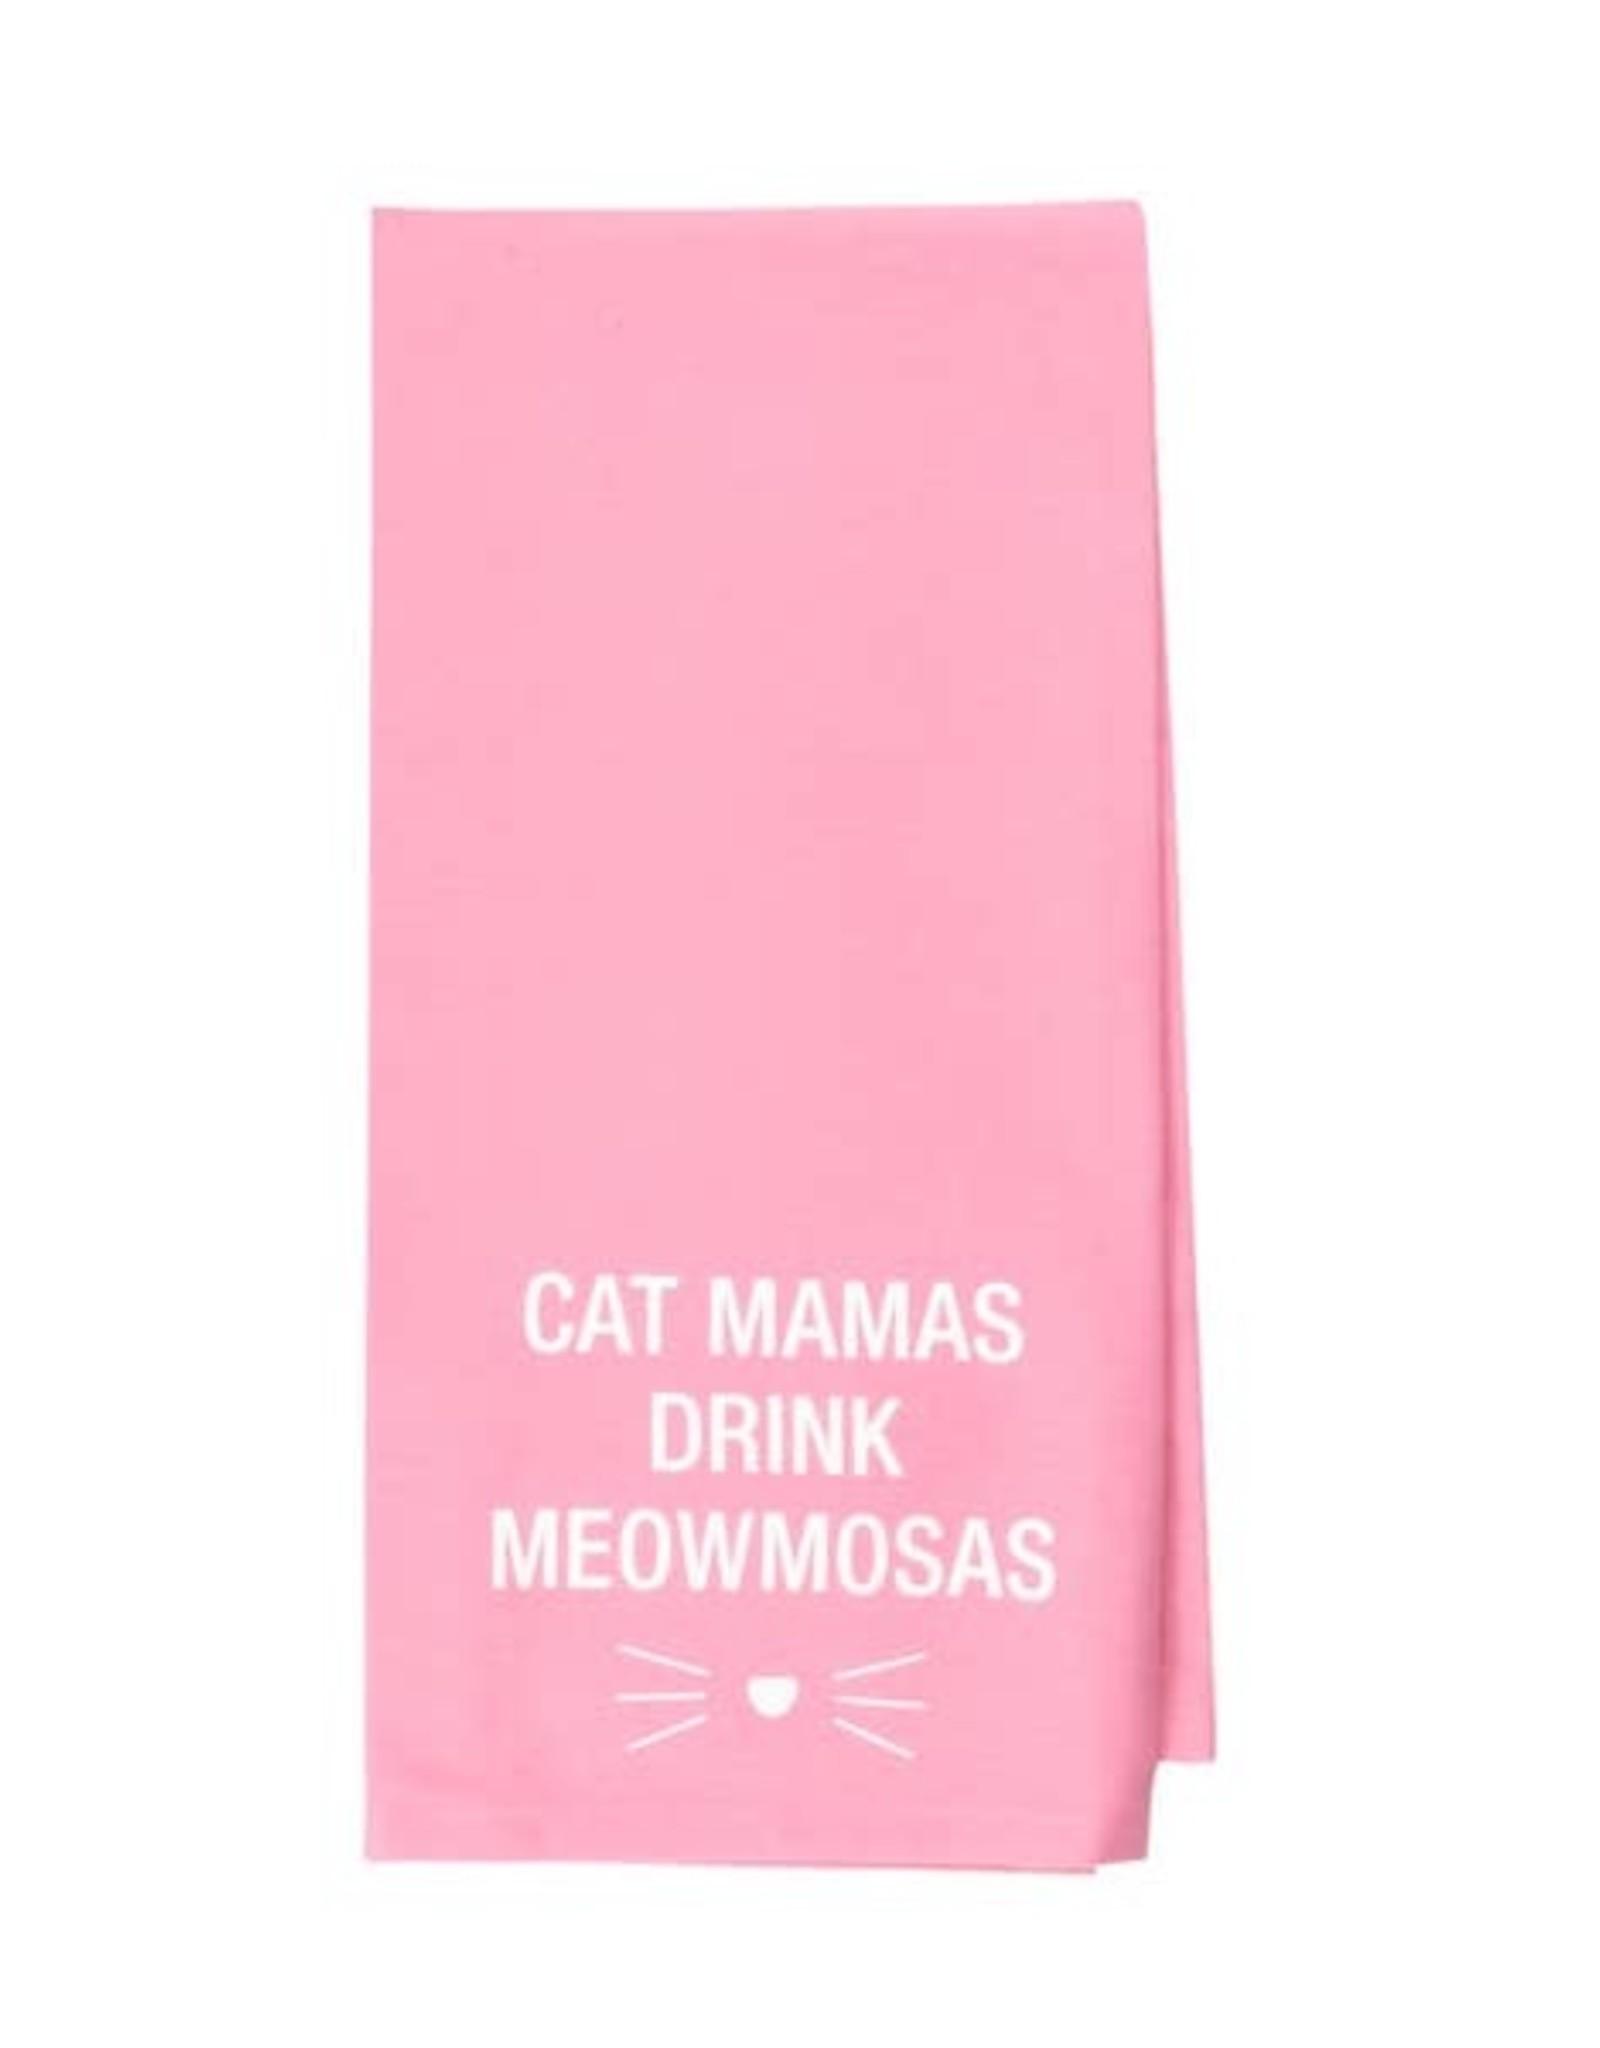 Kitchen Tea Towel - Cat Mamas Drink Meowmosas